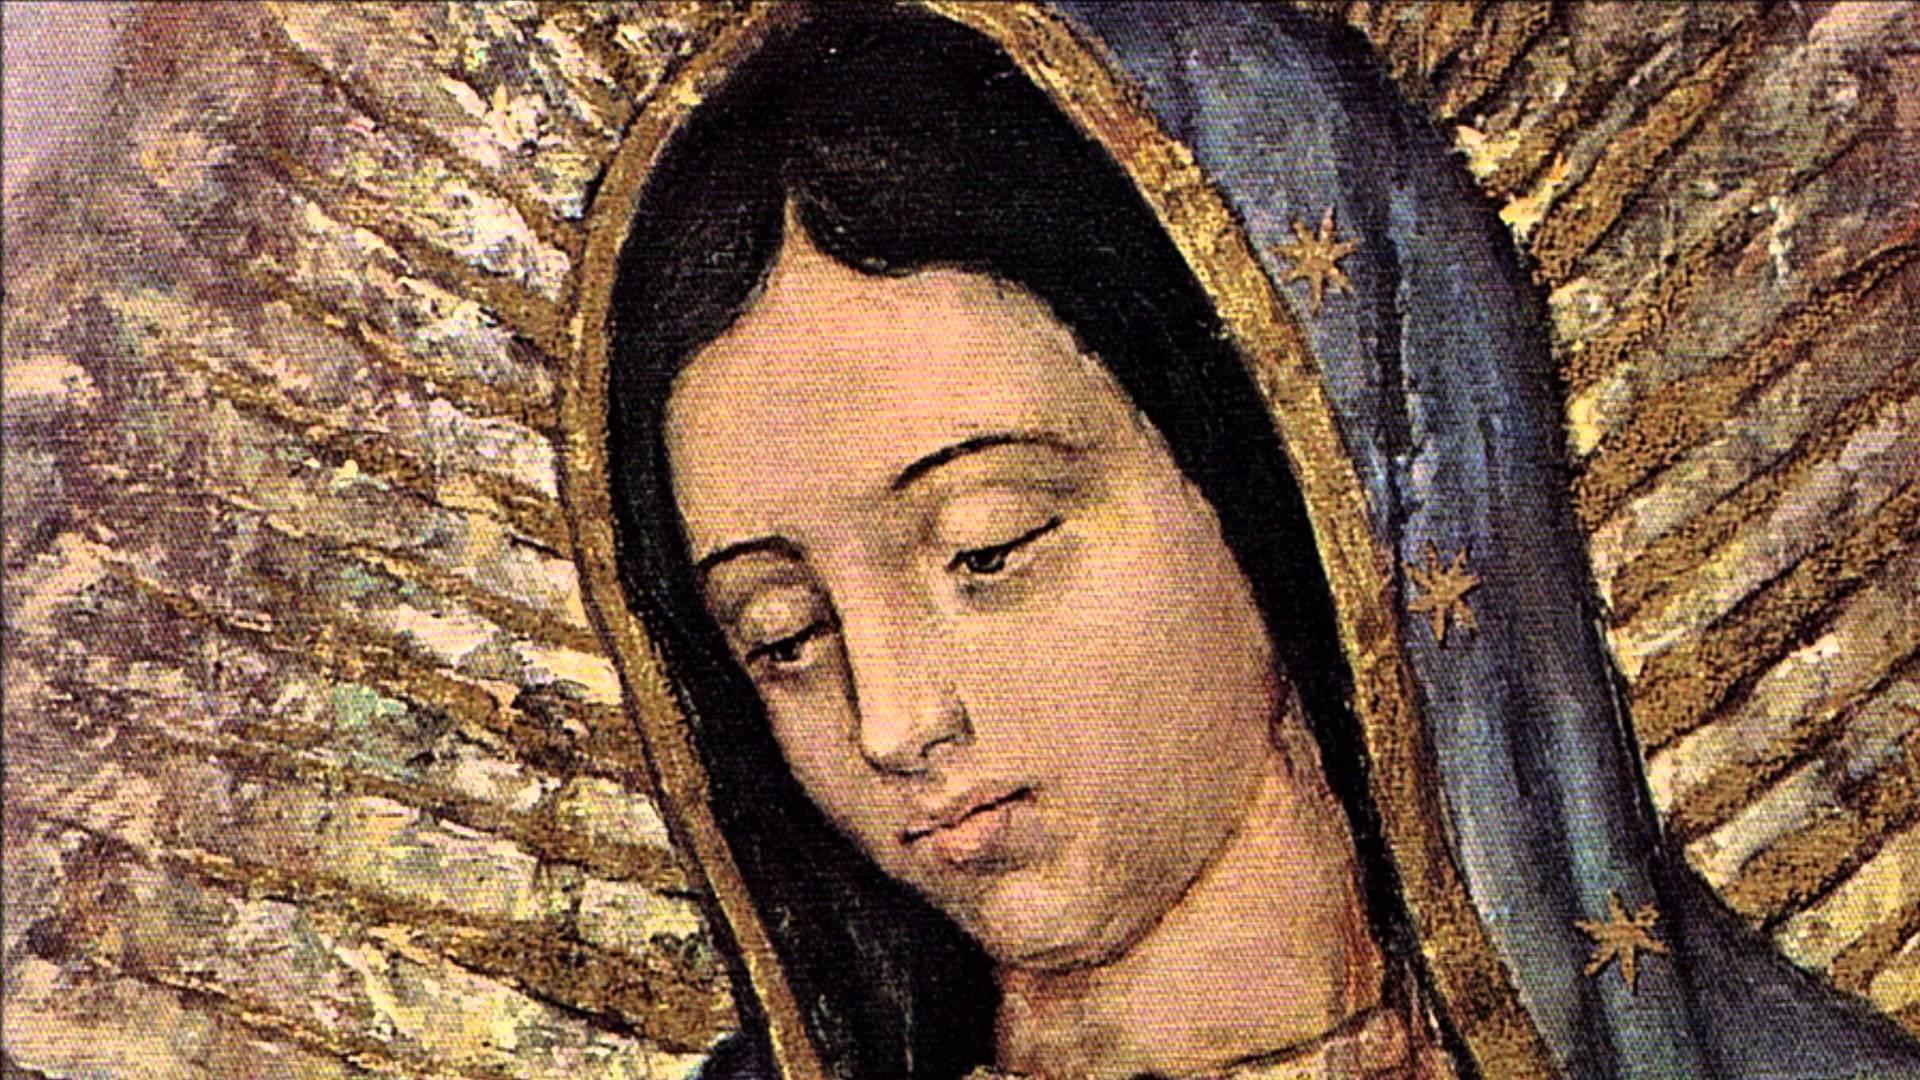 Your Complete Guide To La Virgen De Guadalupe